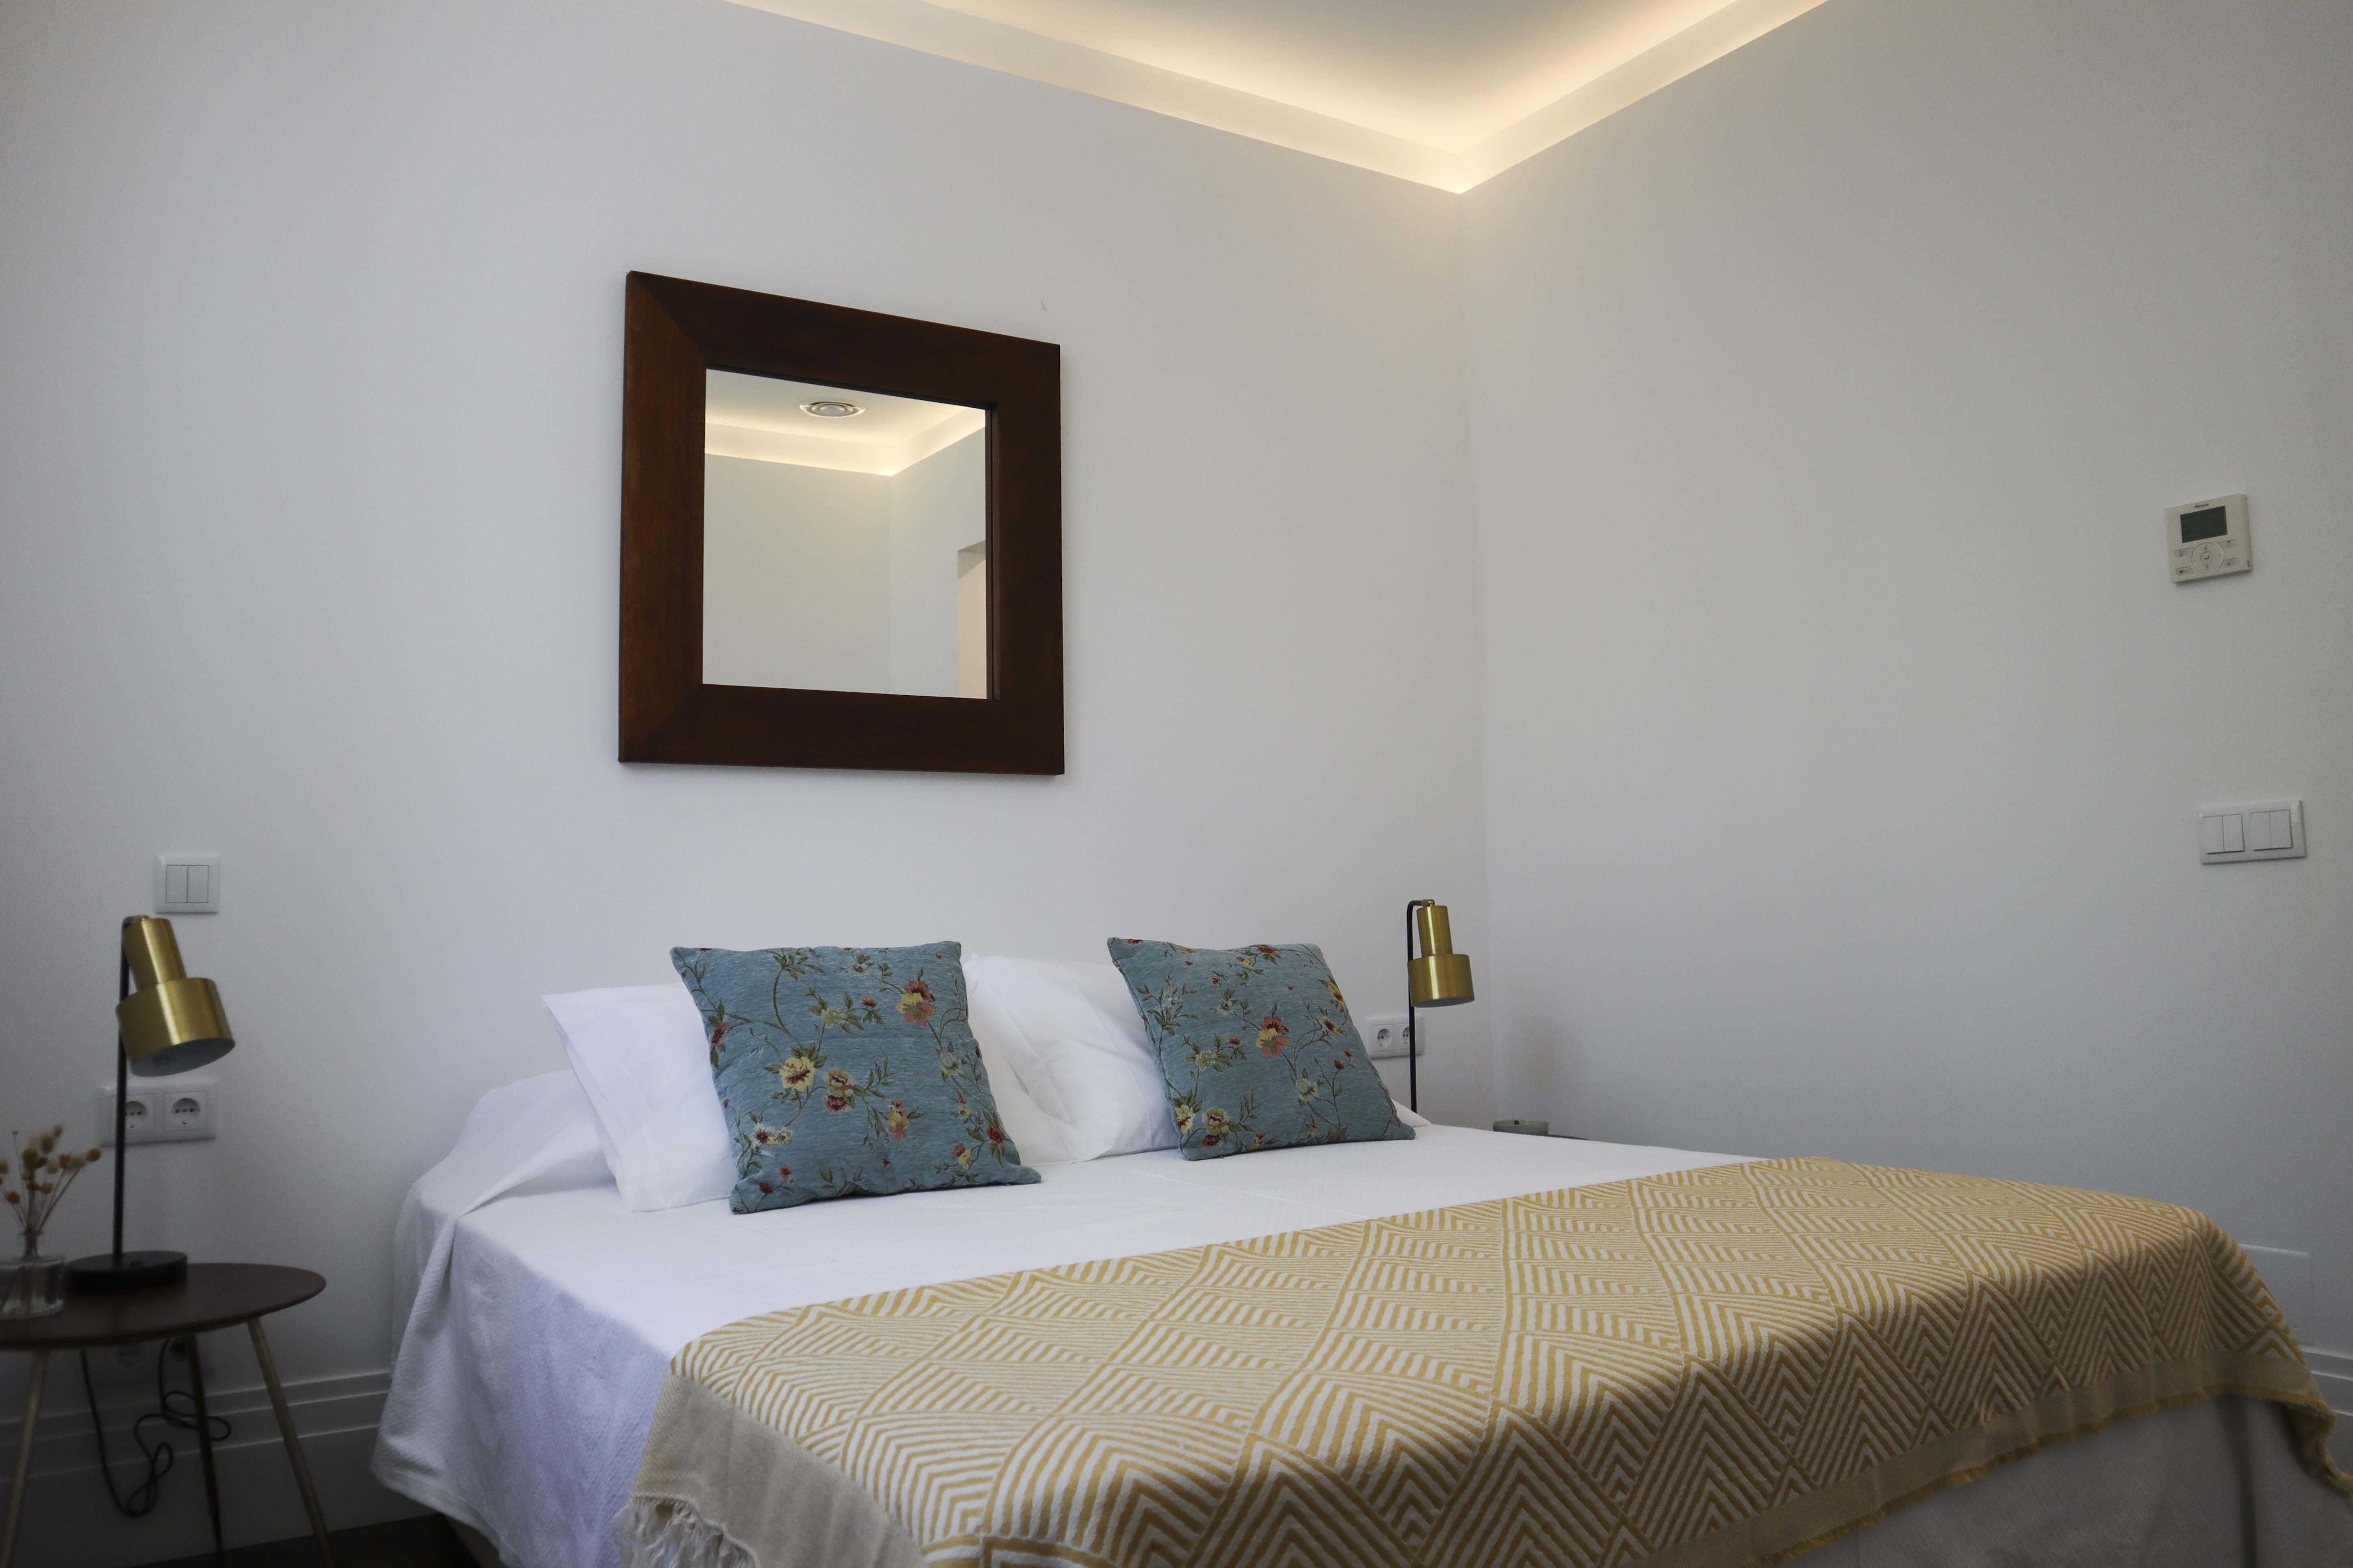 Albano's Room